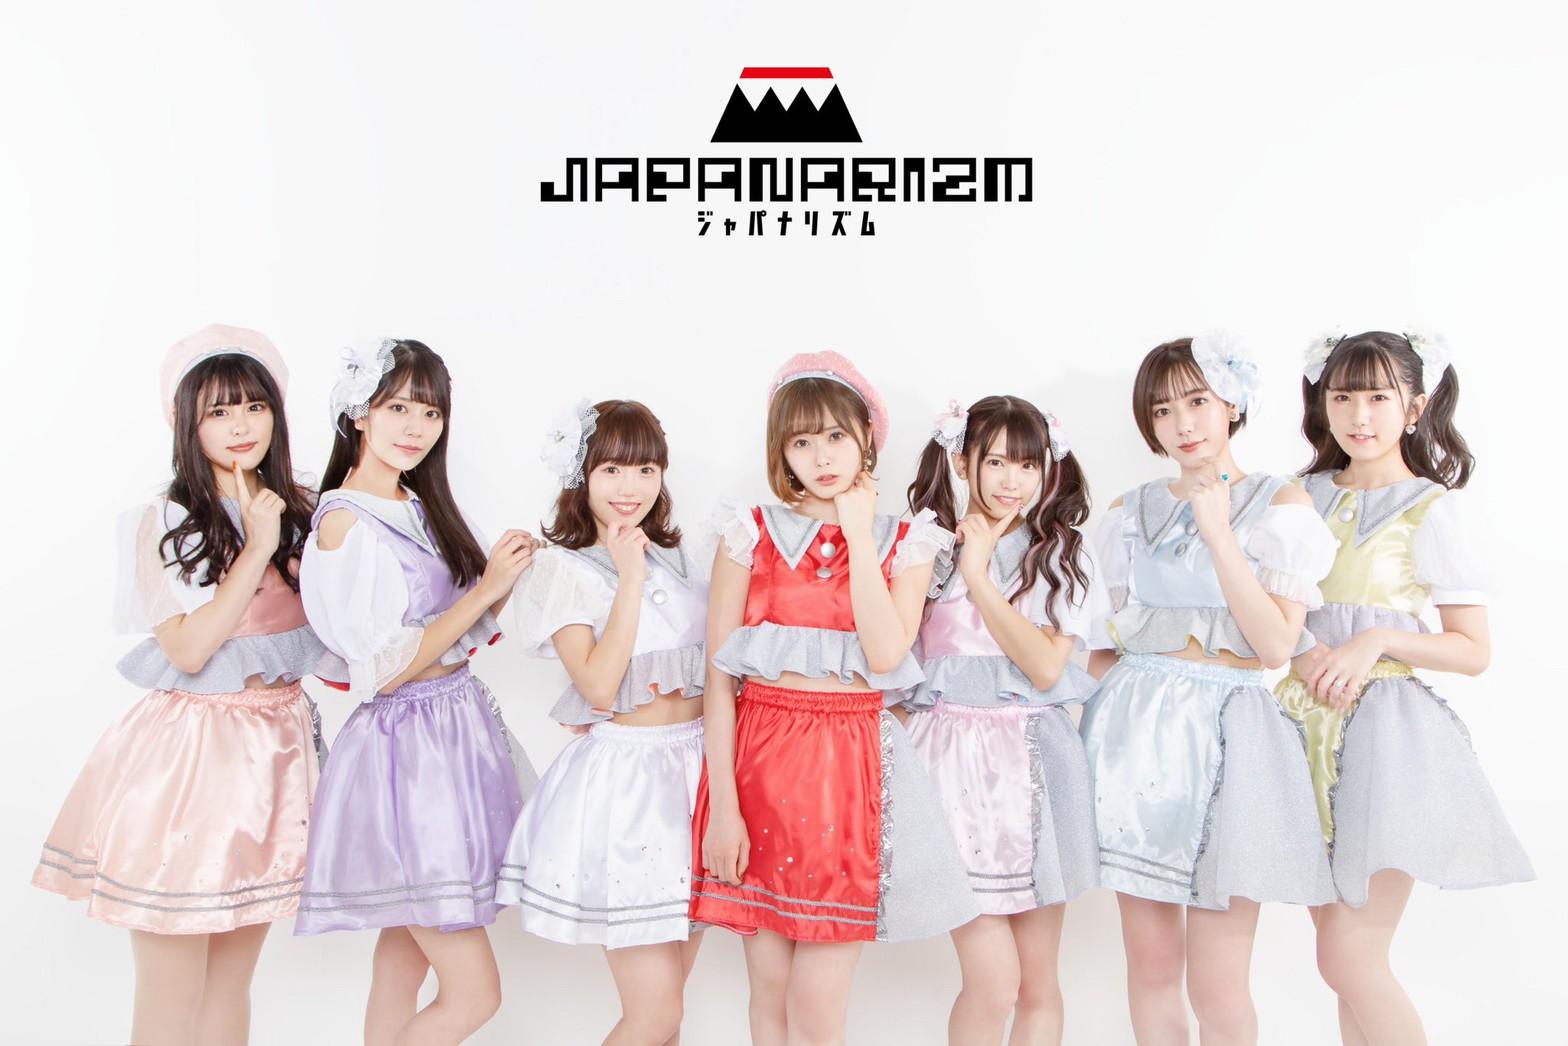 2021/4/25(日) 『JAPANARIZM 無銭不定期 』vol.1〜渋谷DAIA